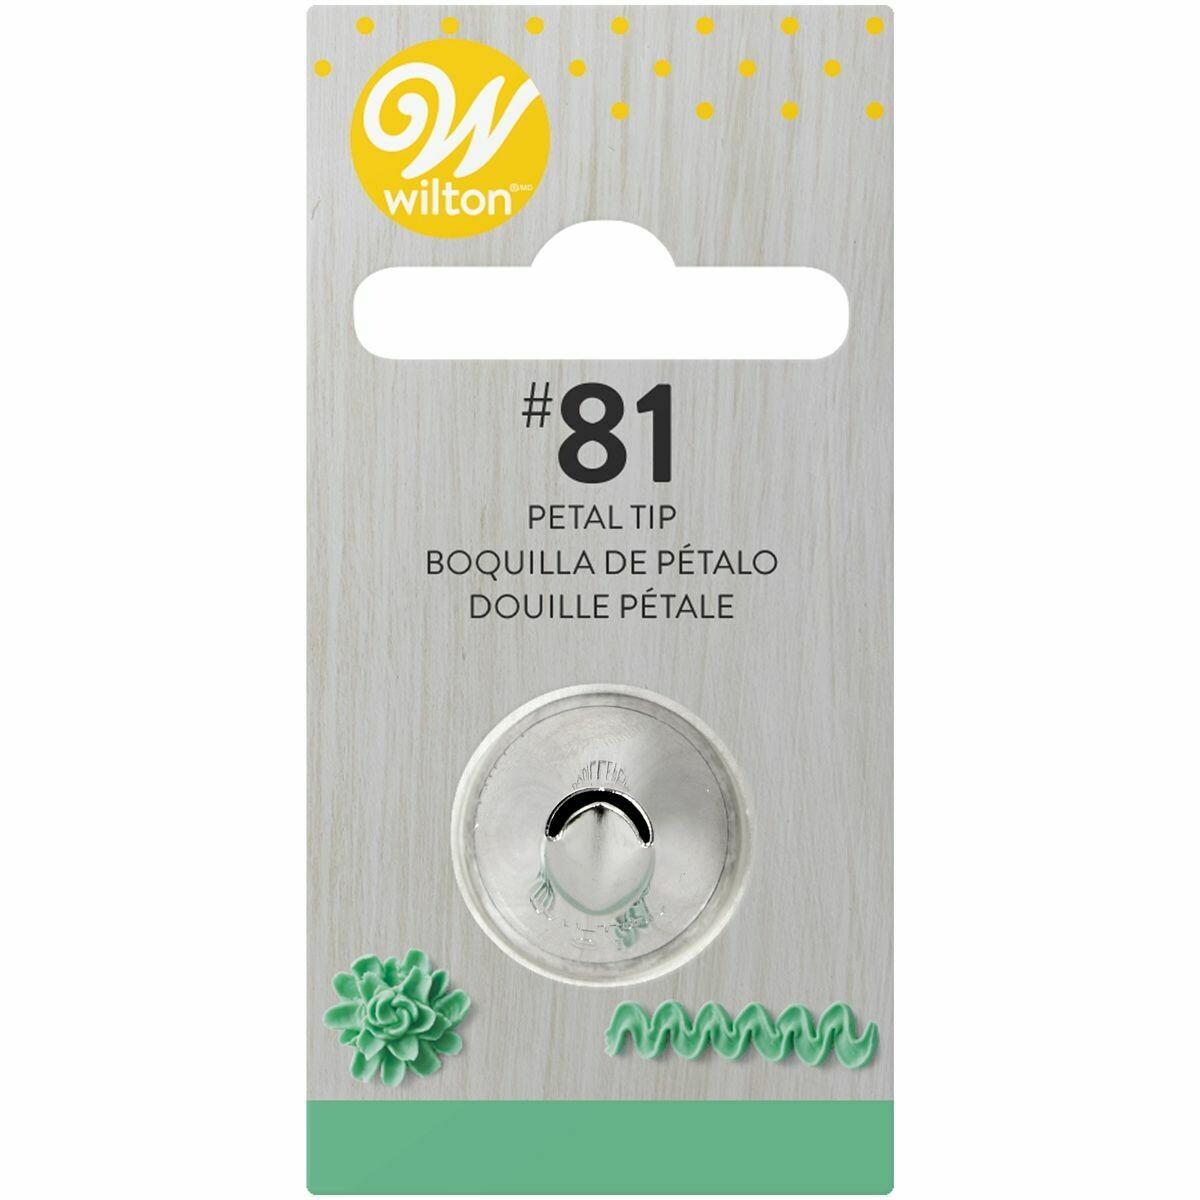 WILTON Nozzle -SPECIALITY TIP No.81 - Μύτη κορνέ Πέταλο Λουλουδιού